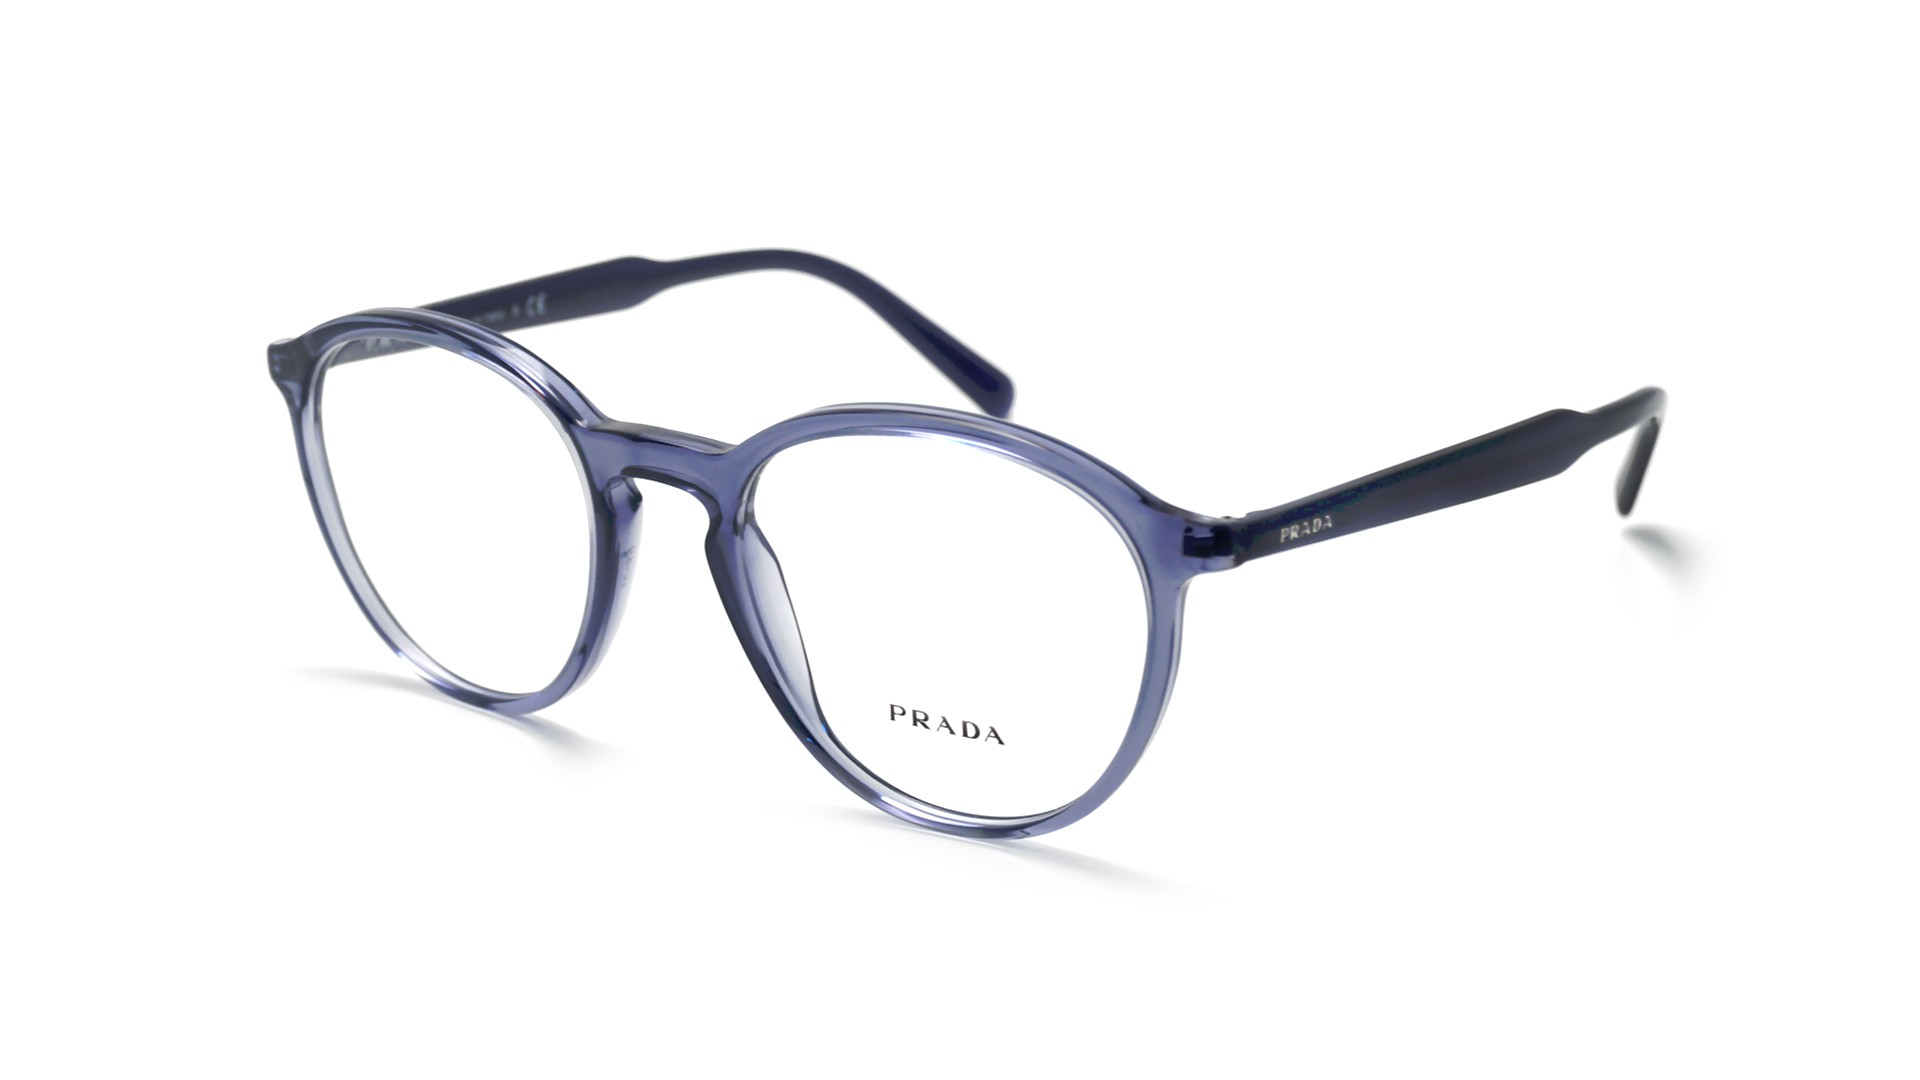 5b3f894c0598 Eyeglasses Prada PR13TV VAV101 51-20 Blue Medium